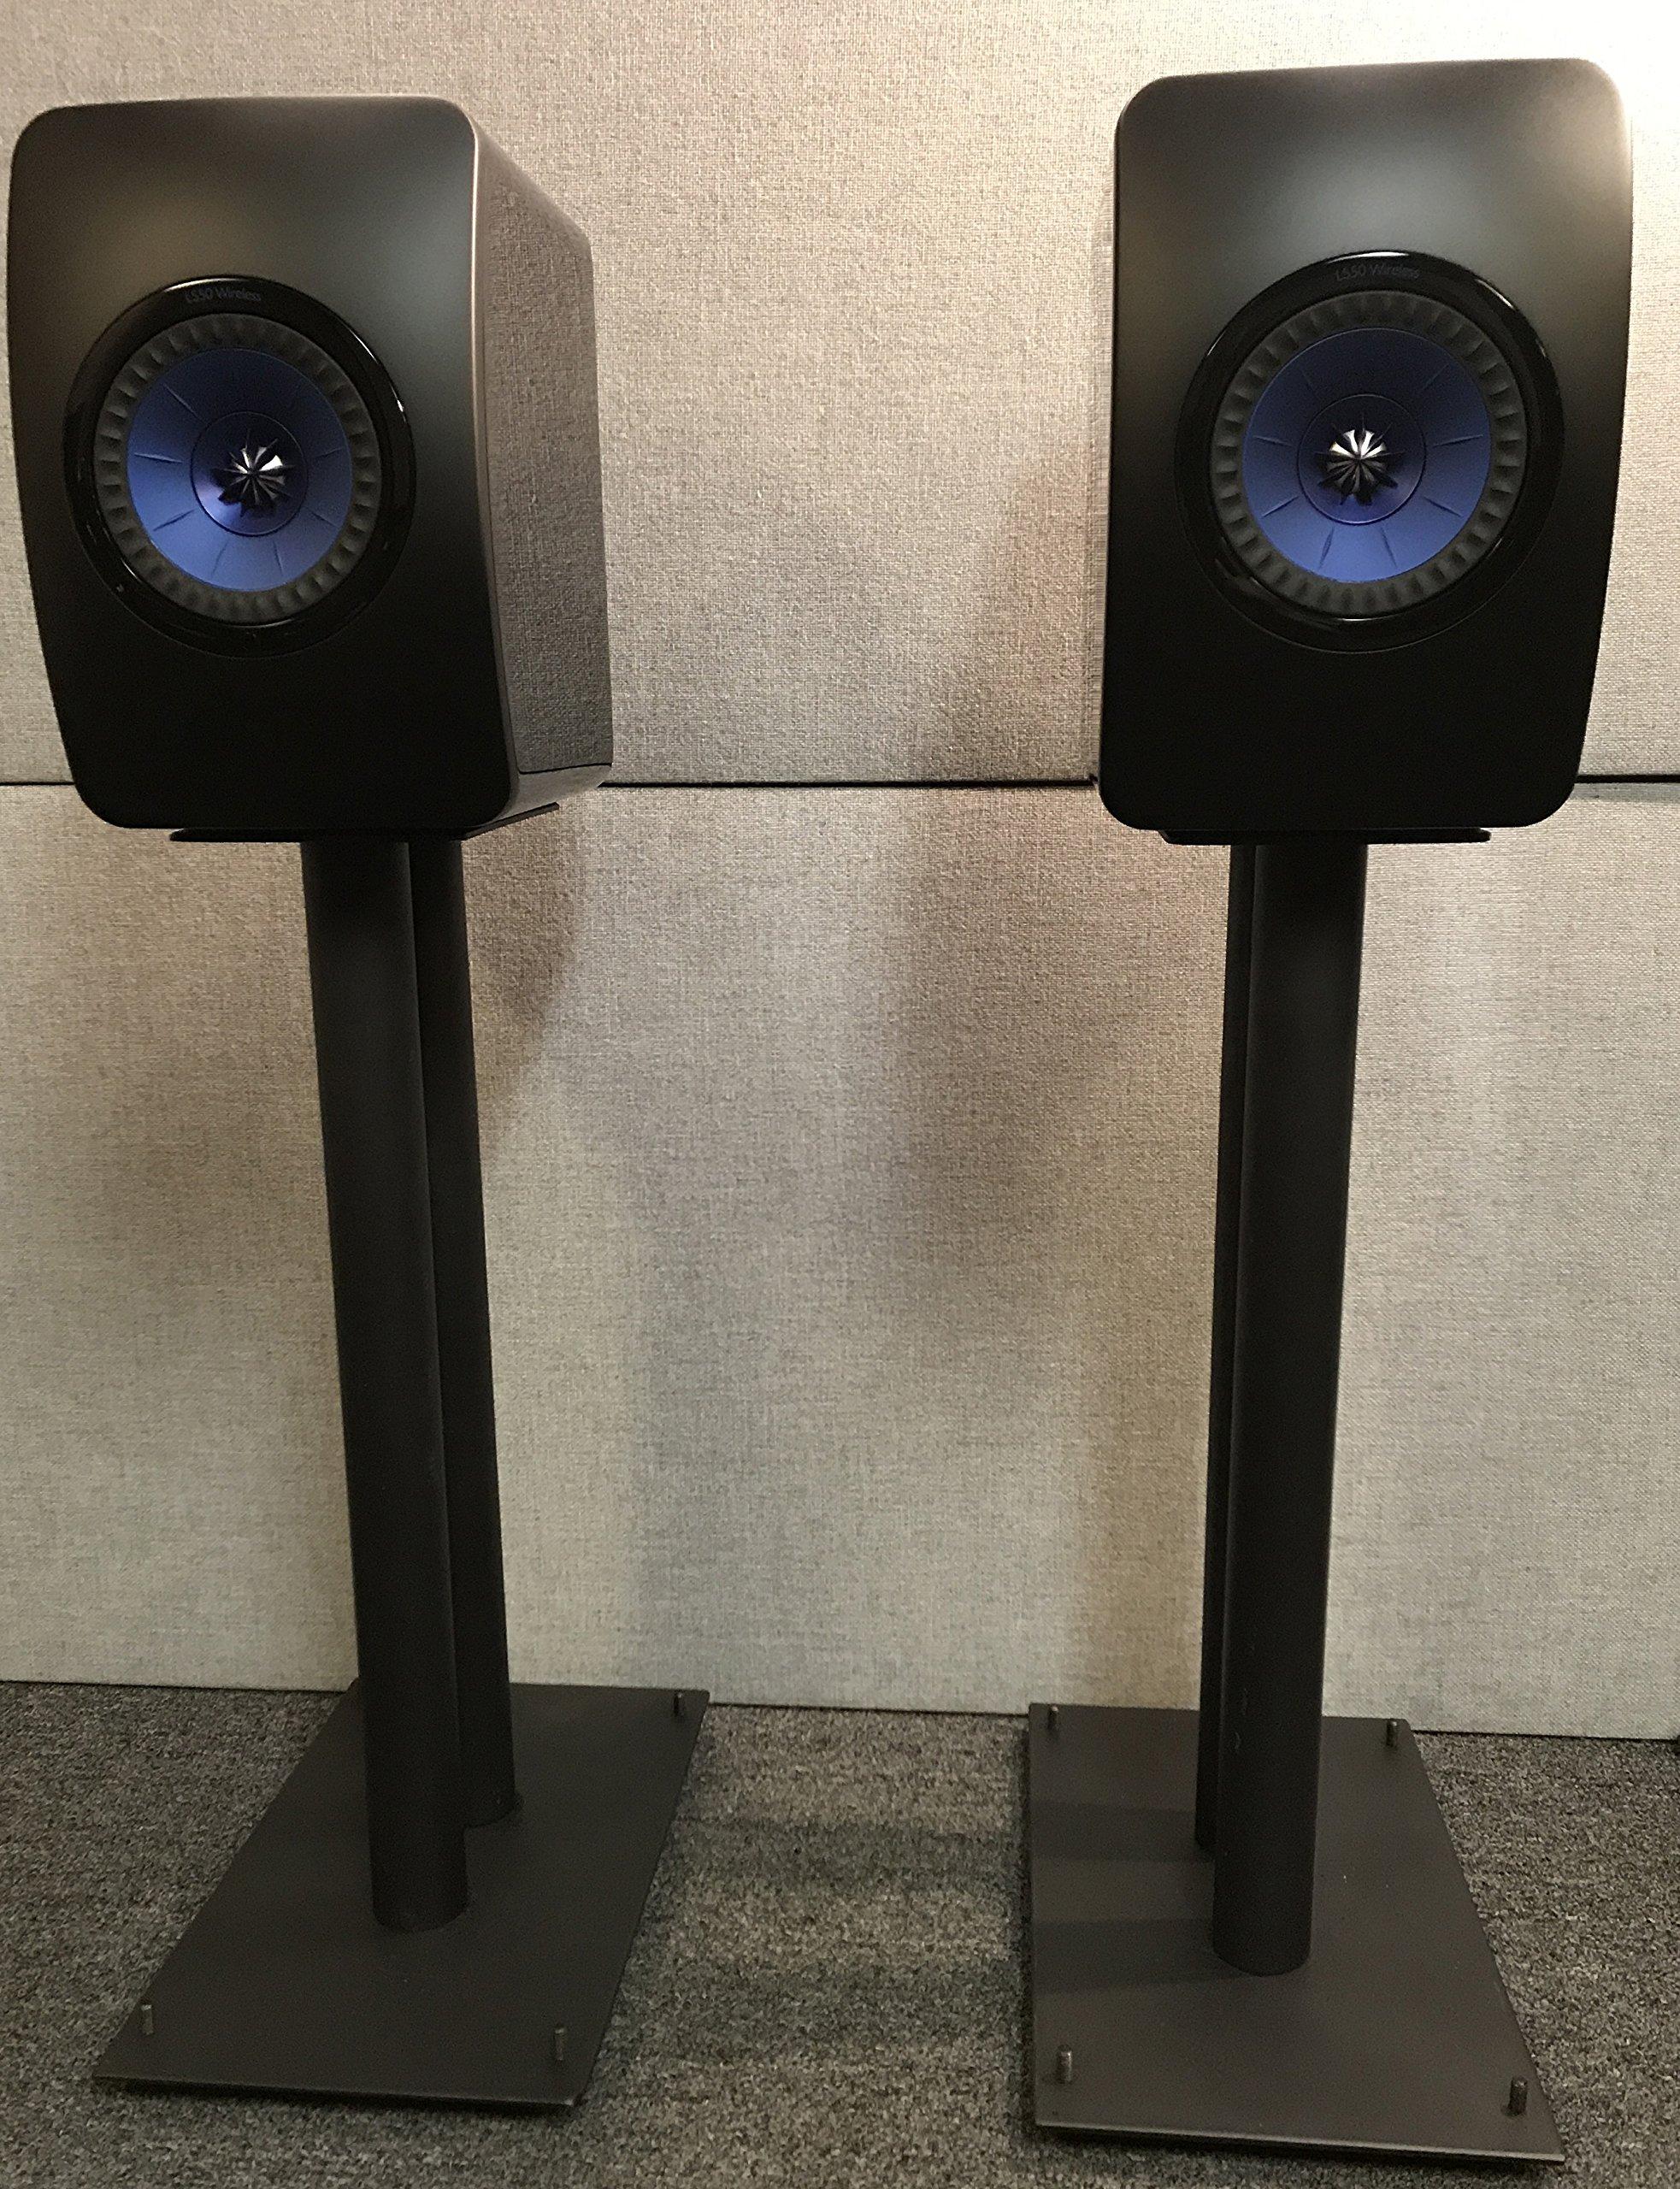 "24"" Heavy Duty, All-Steel Floor Speaker Stands by Vega A/V Systems   Fillable   for KEF Bookshelf Speakers   Steel Carpet Spikes   Set of 2   Black Powder Coating"